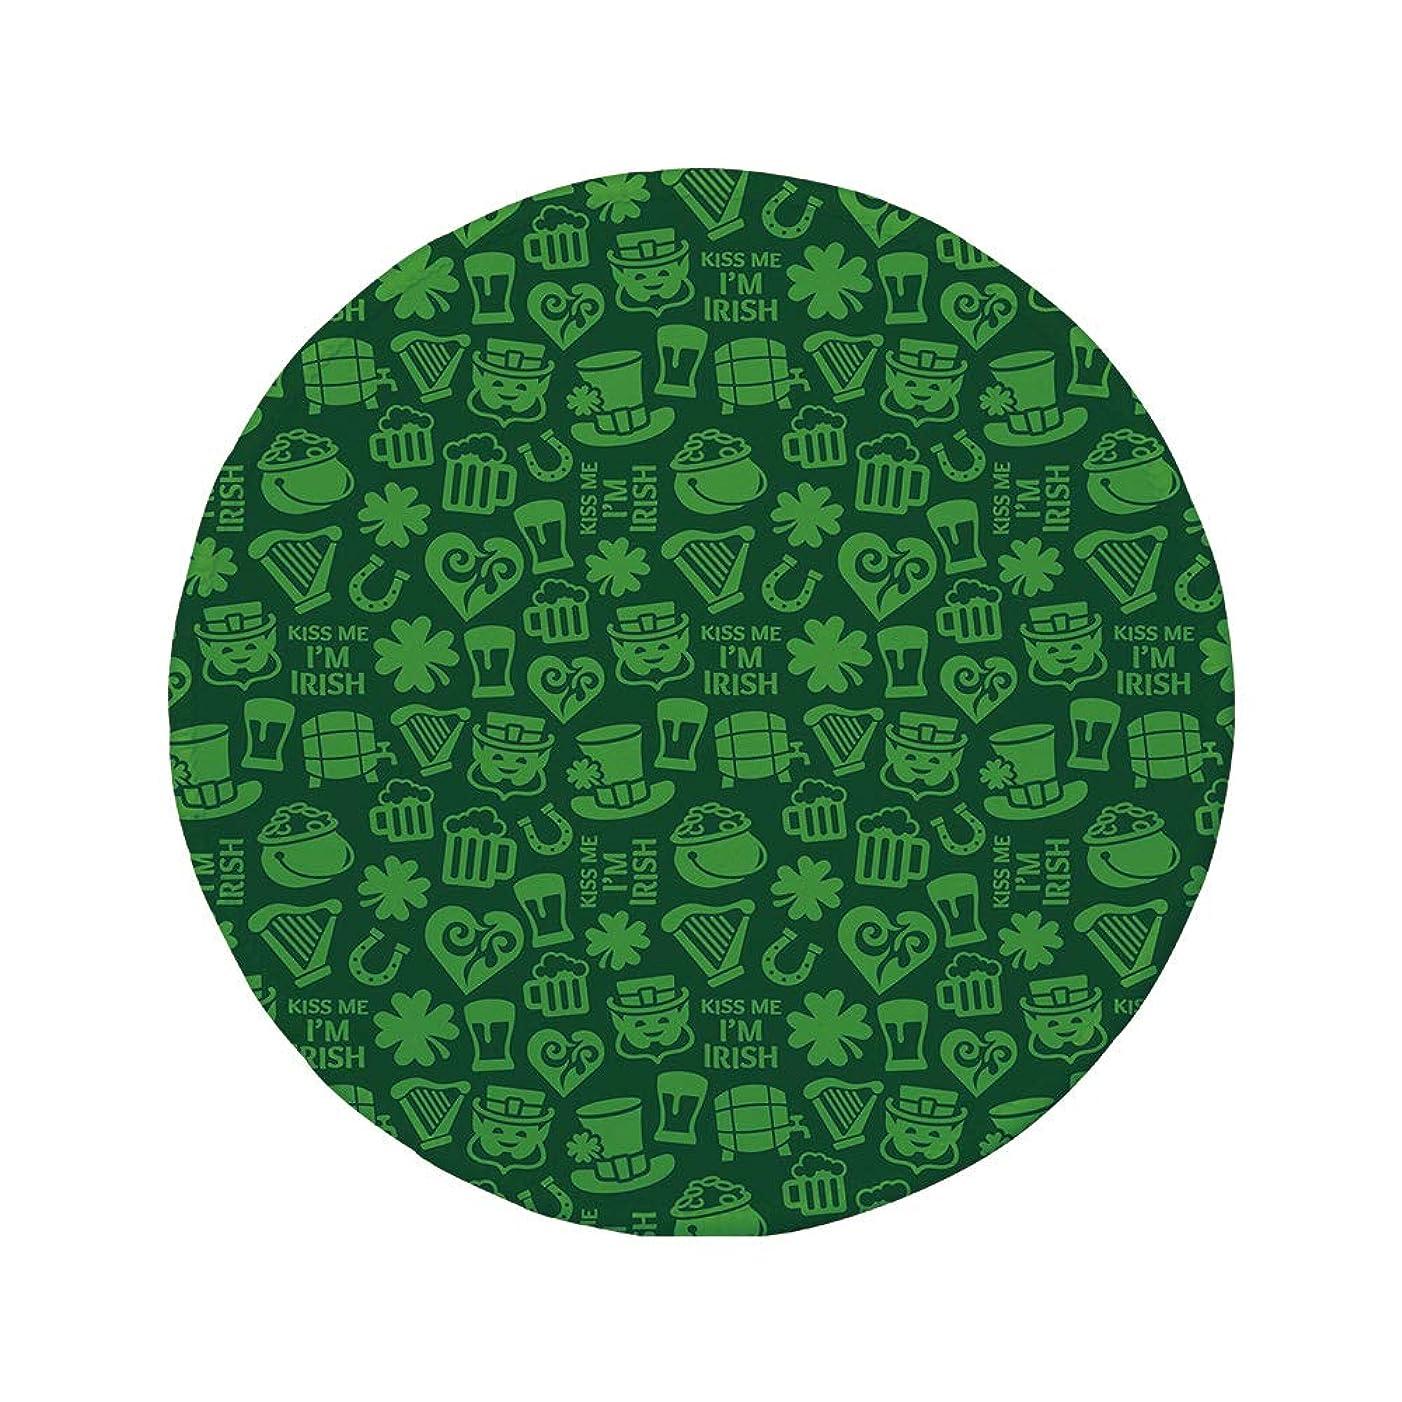 Non-Slip Rubber Round Mouse Pad,Irish,Kiss Me Im Irish Humorous Phrase with Ale Shamrocks Hats Traditional Symbols Decorative,Green Lime Green,7.87